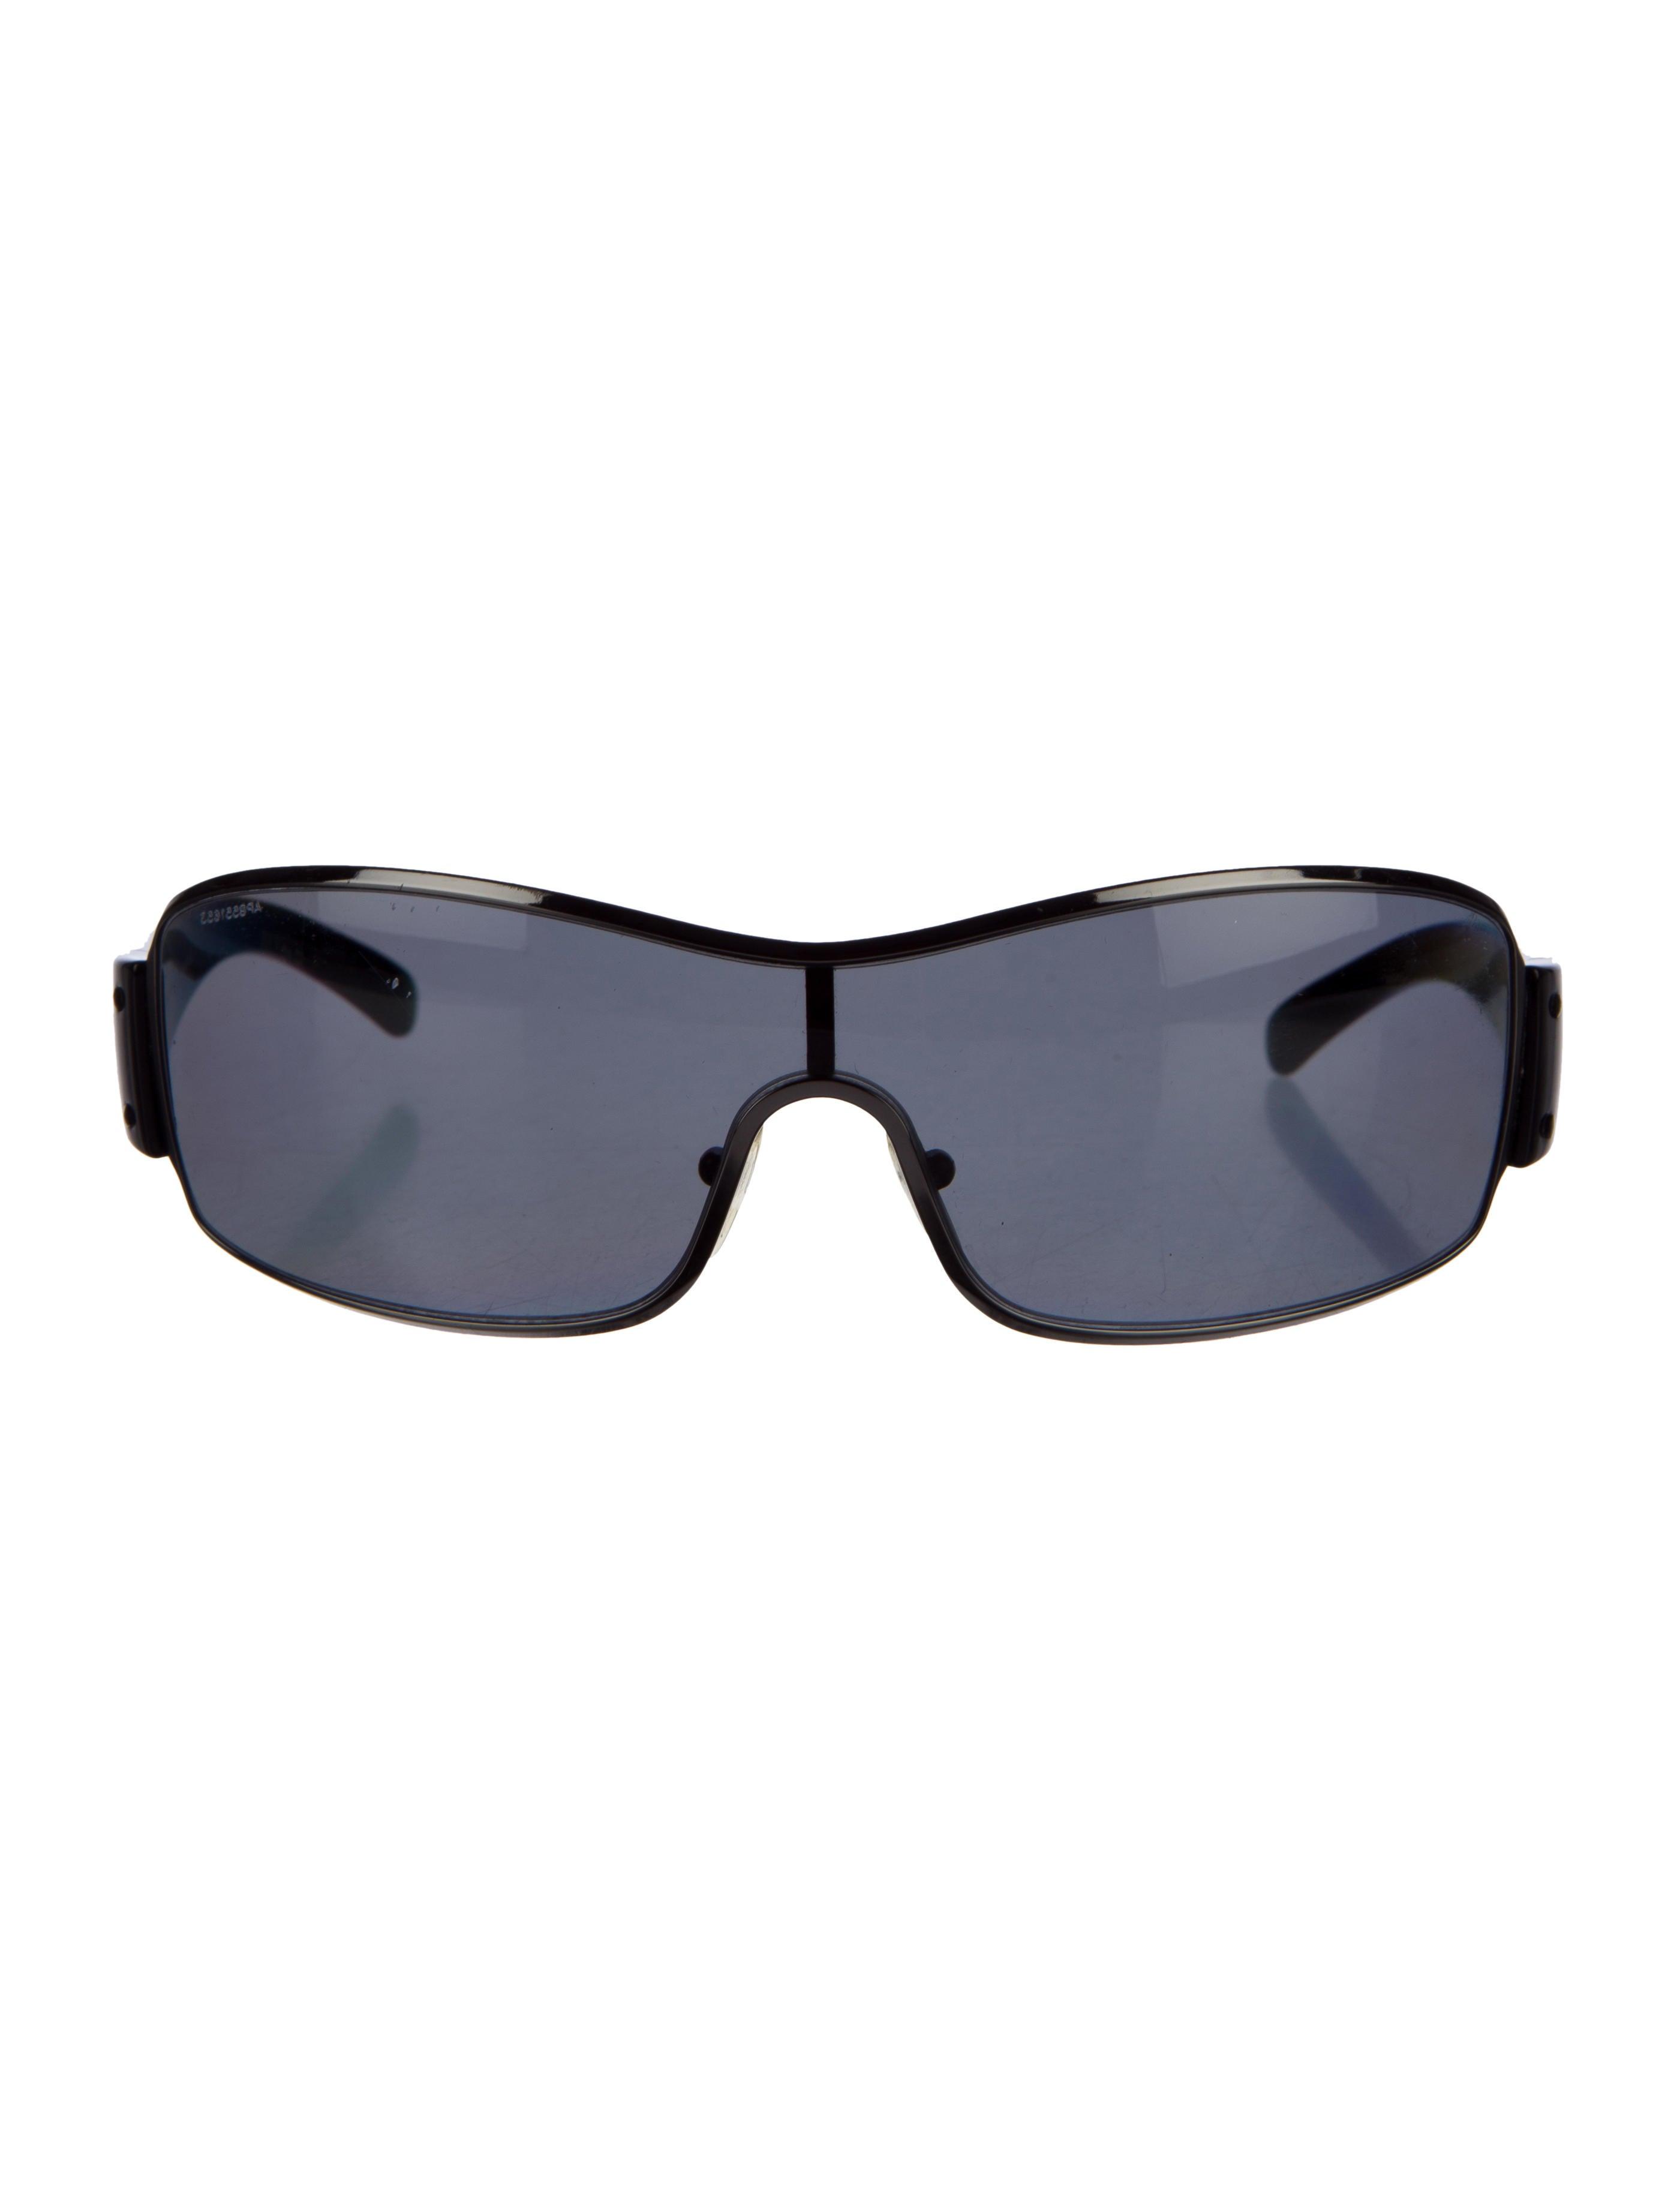 00c4d83d1ef Polarized Shield Style Sunglasses « Heritage Malta